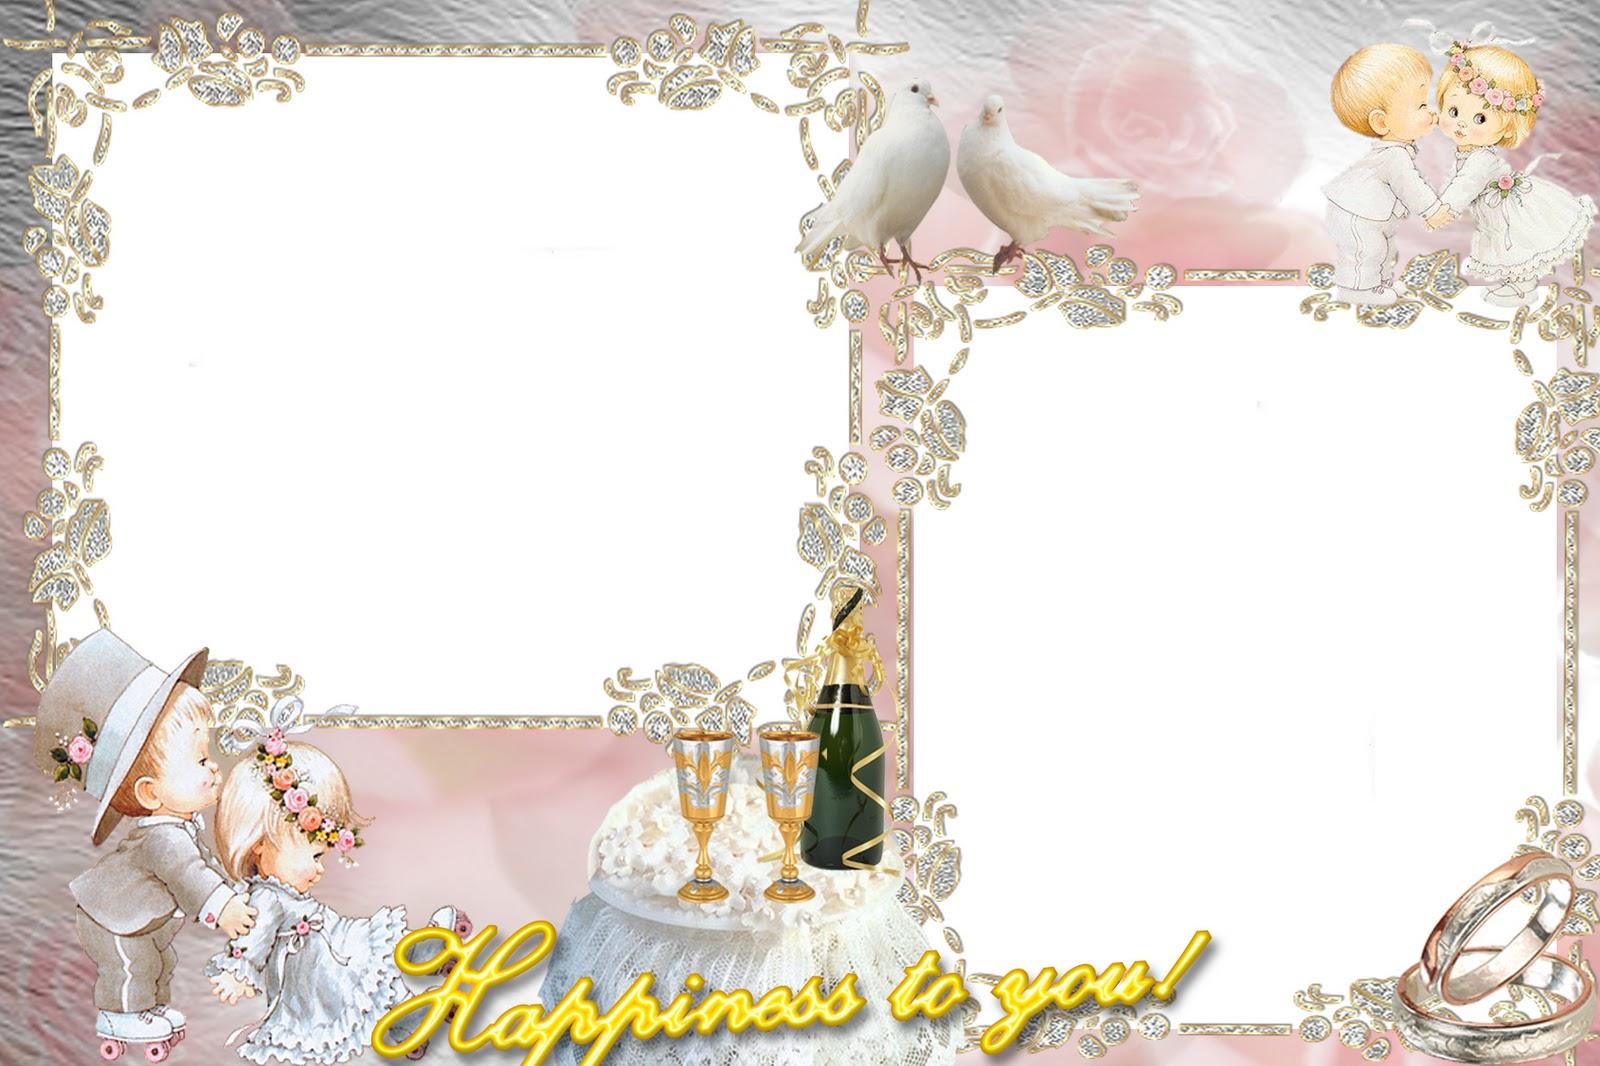 Free Photoshop Wedding Frames